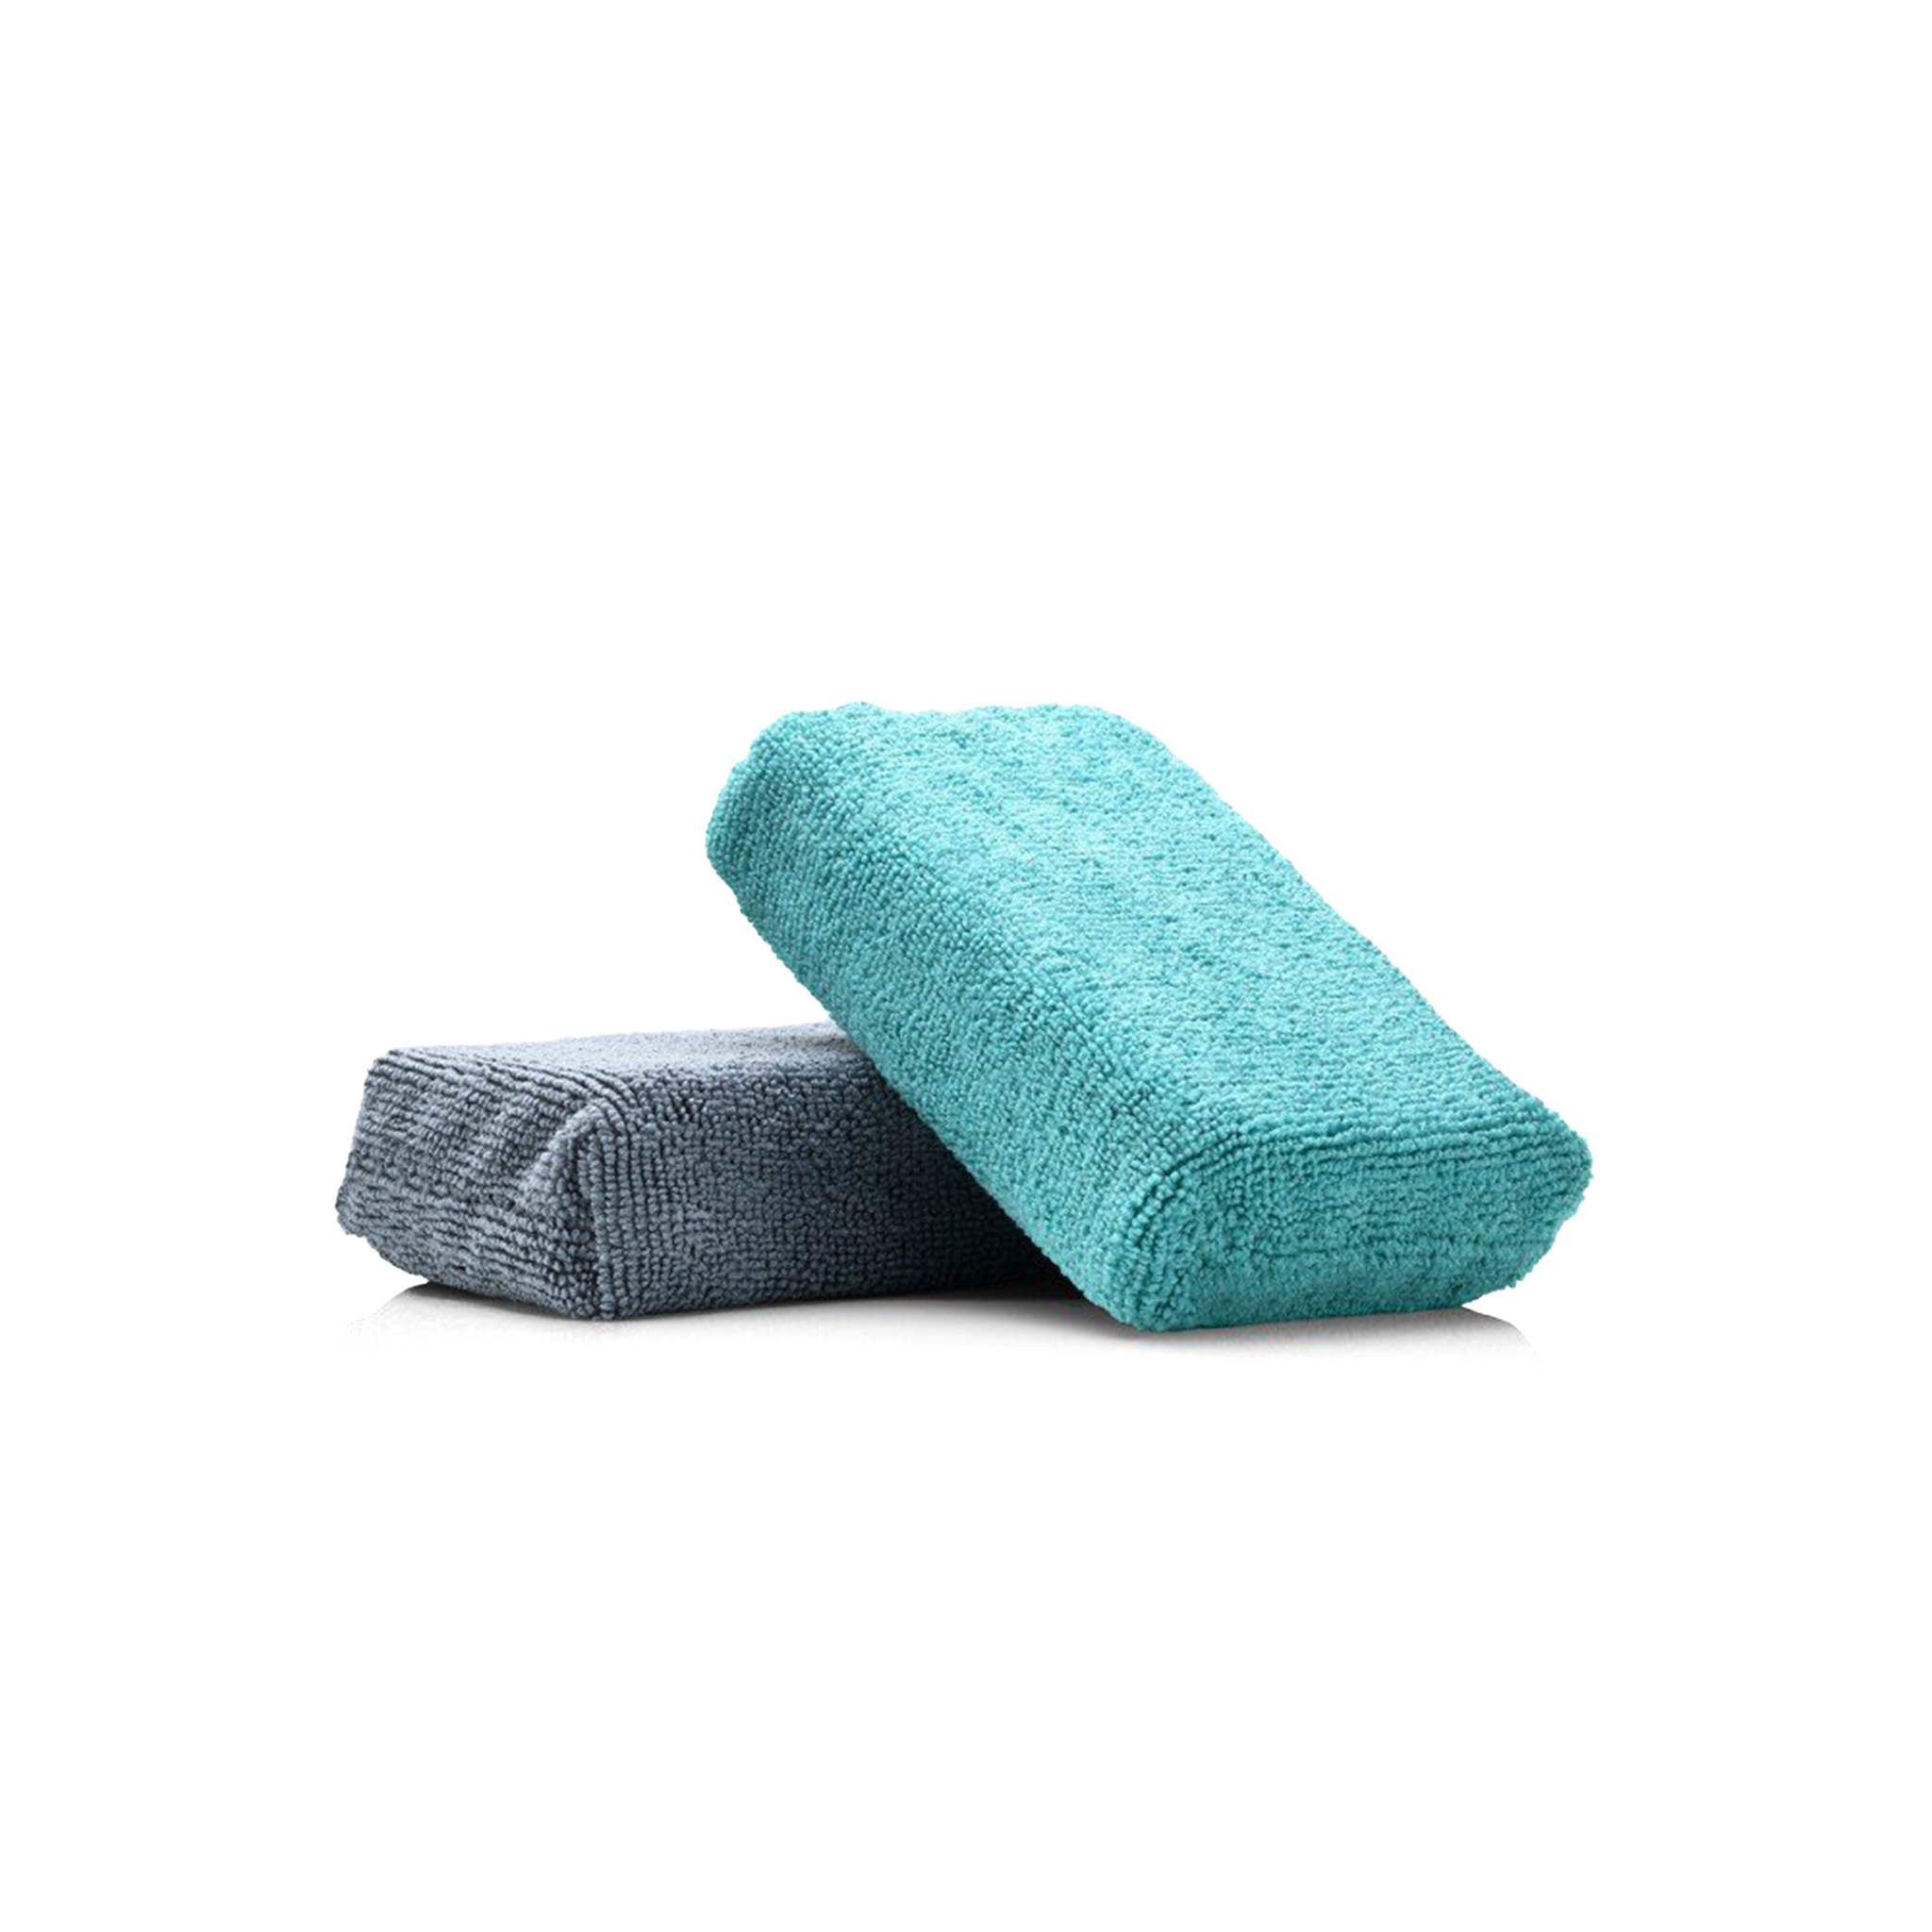 Appliceringssvamp Finesse Microfibre Polishing Pads, 2 st